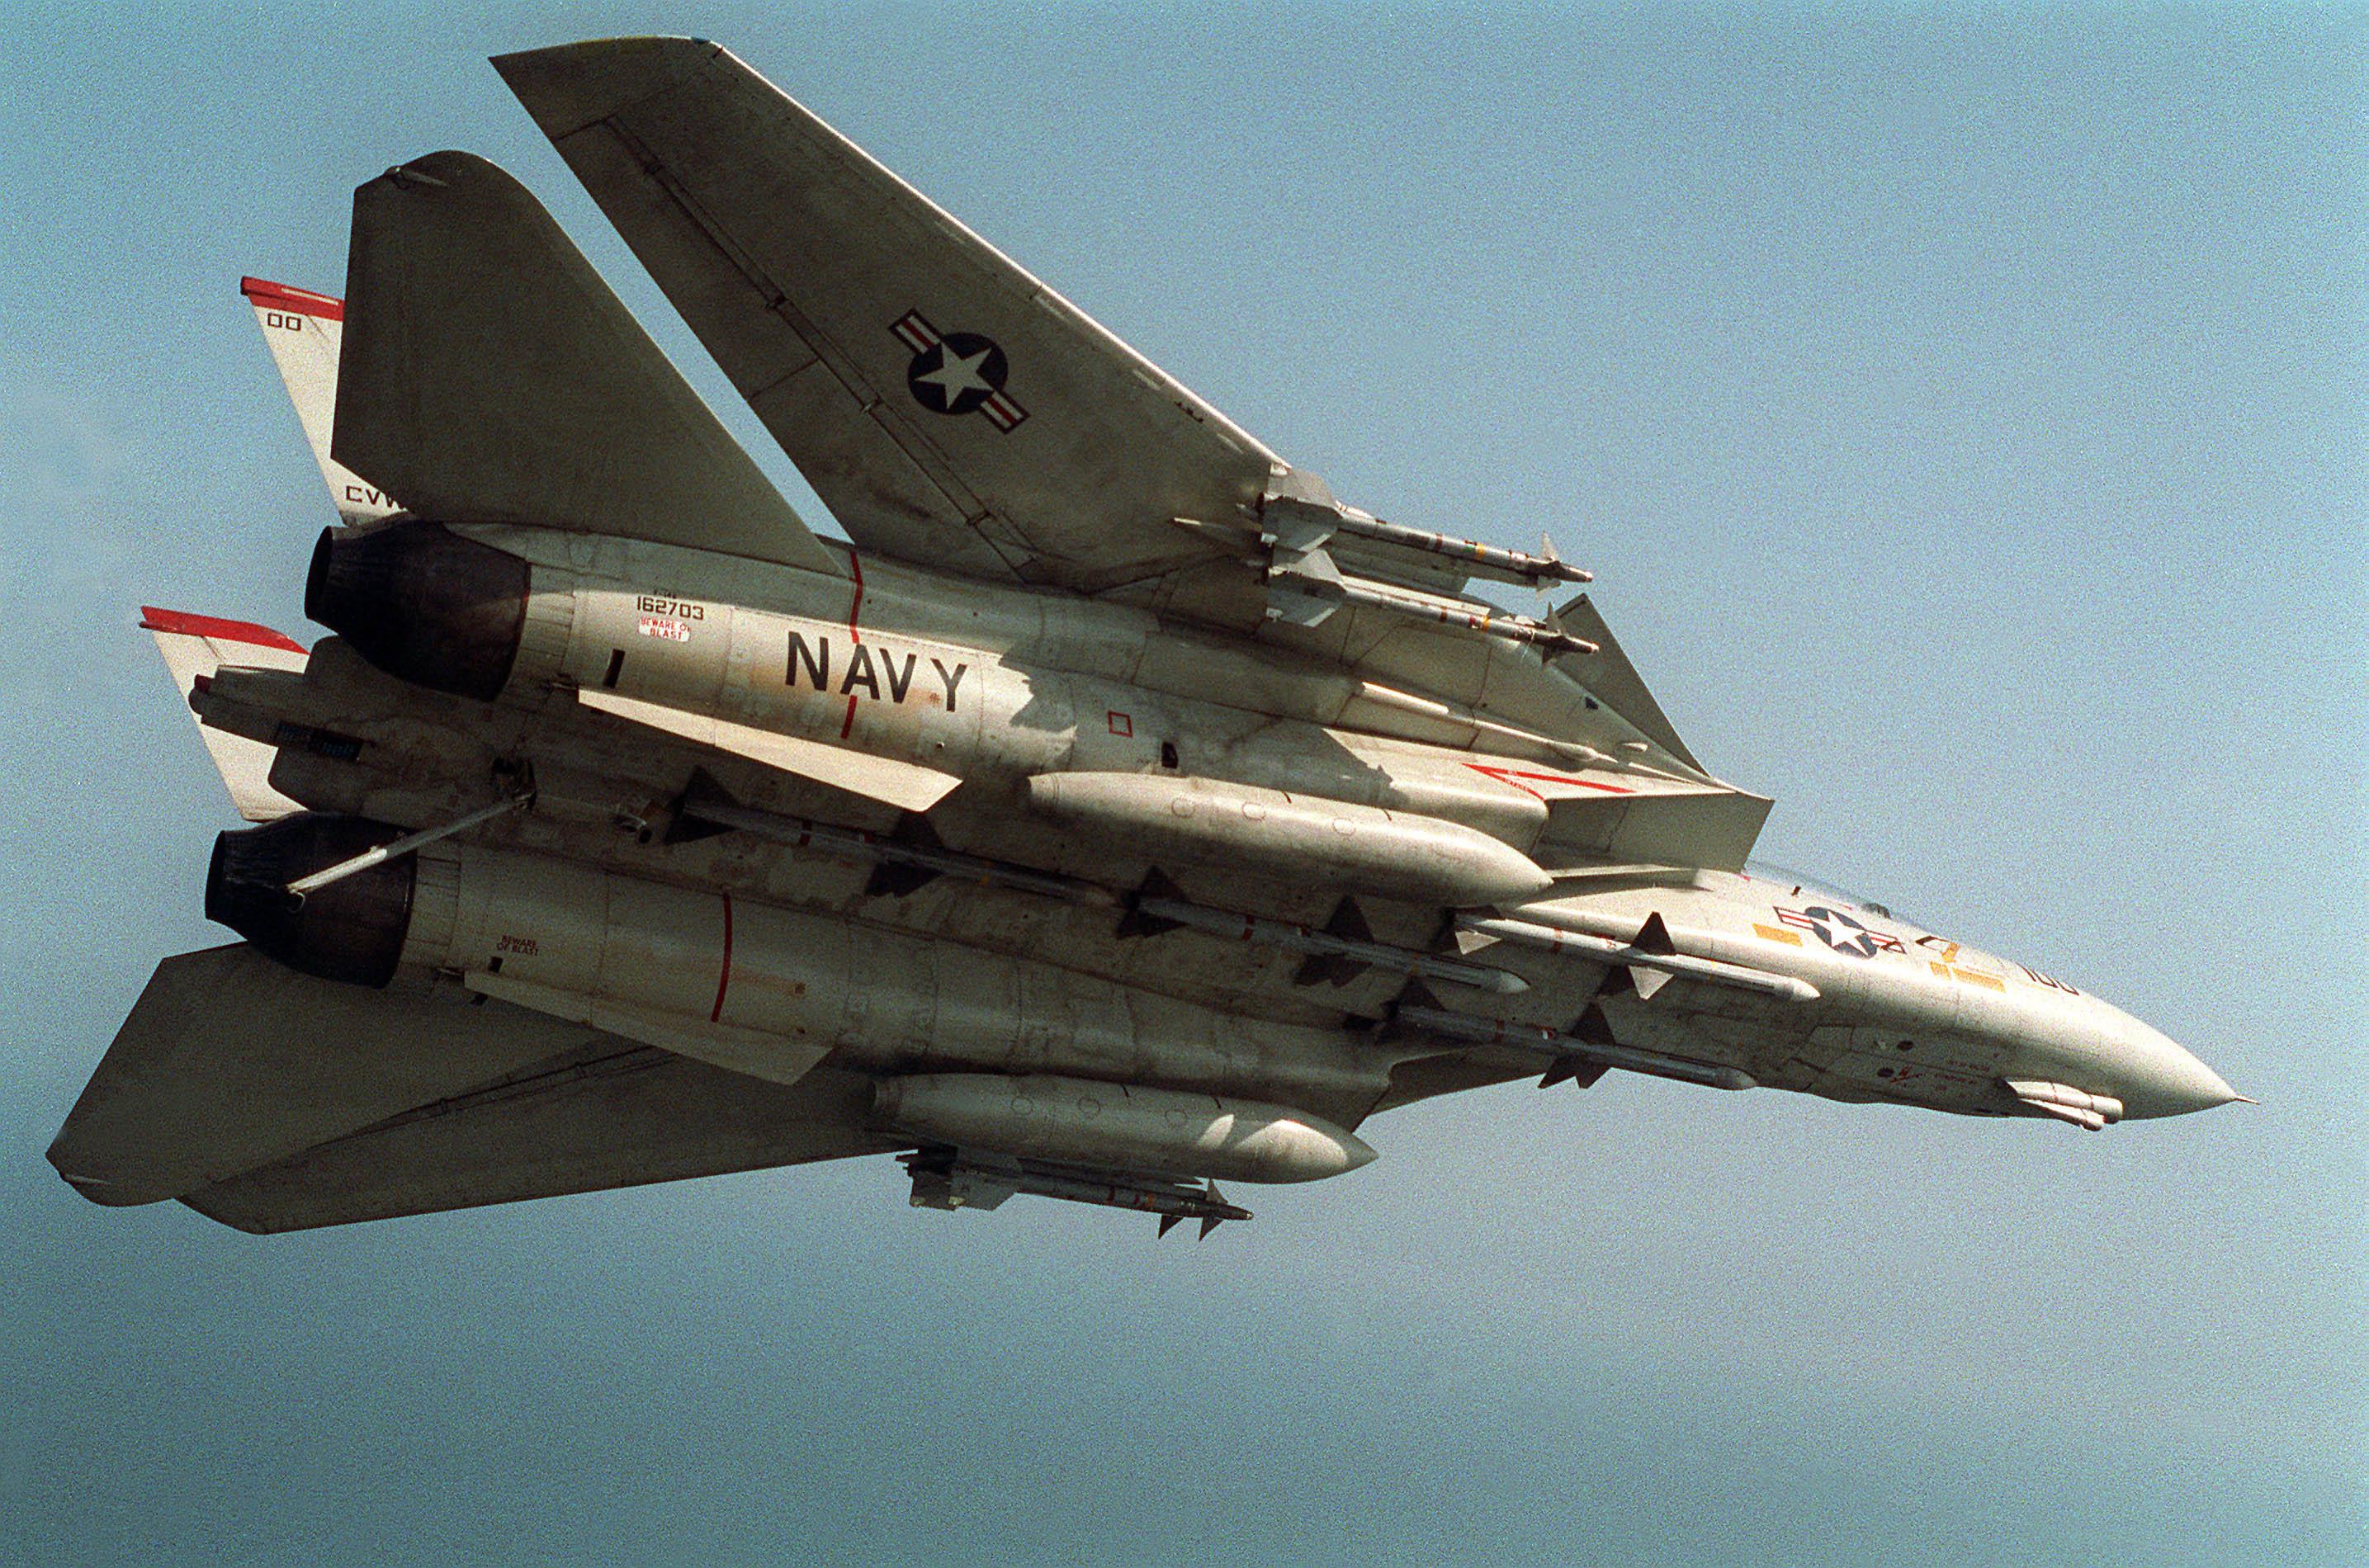 F 14 (戦闘機)の画像 p1_39